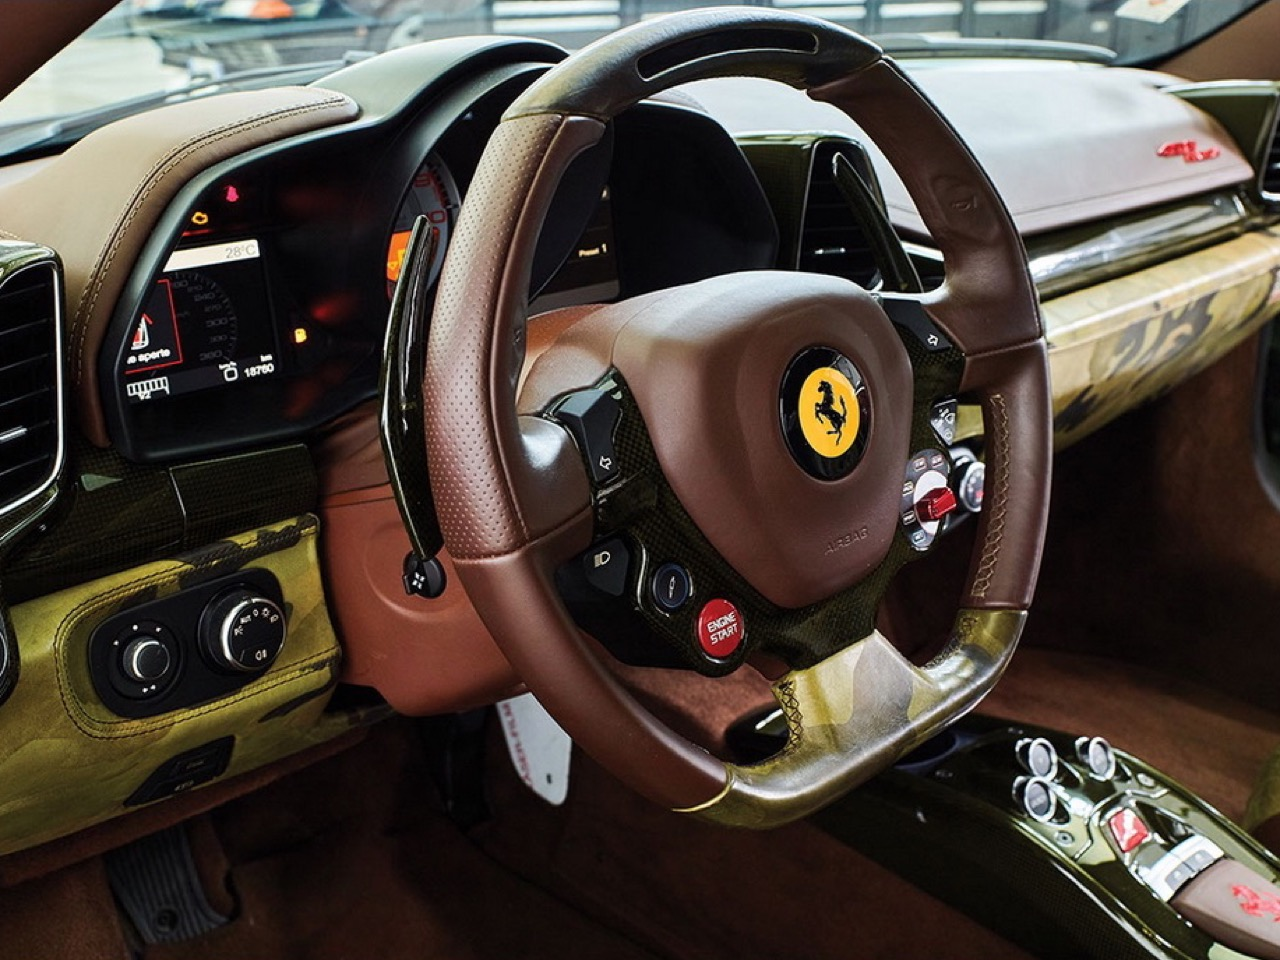 Ferrari 458 Italia Lapo Elkann in auction (13)